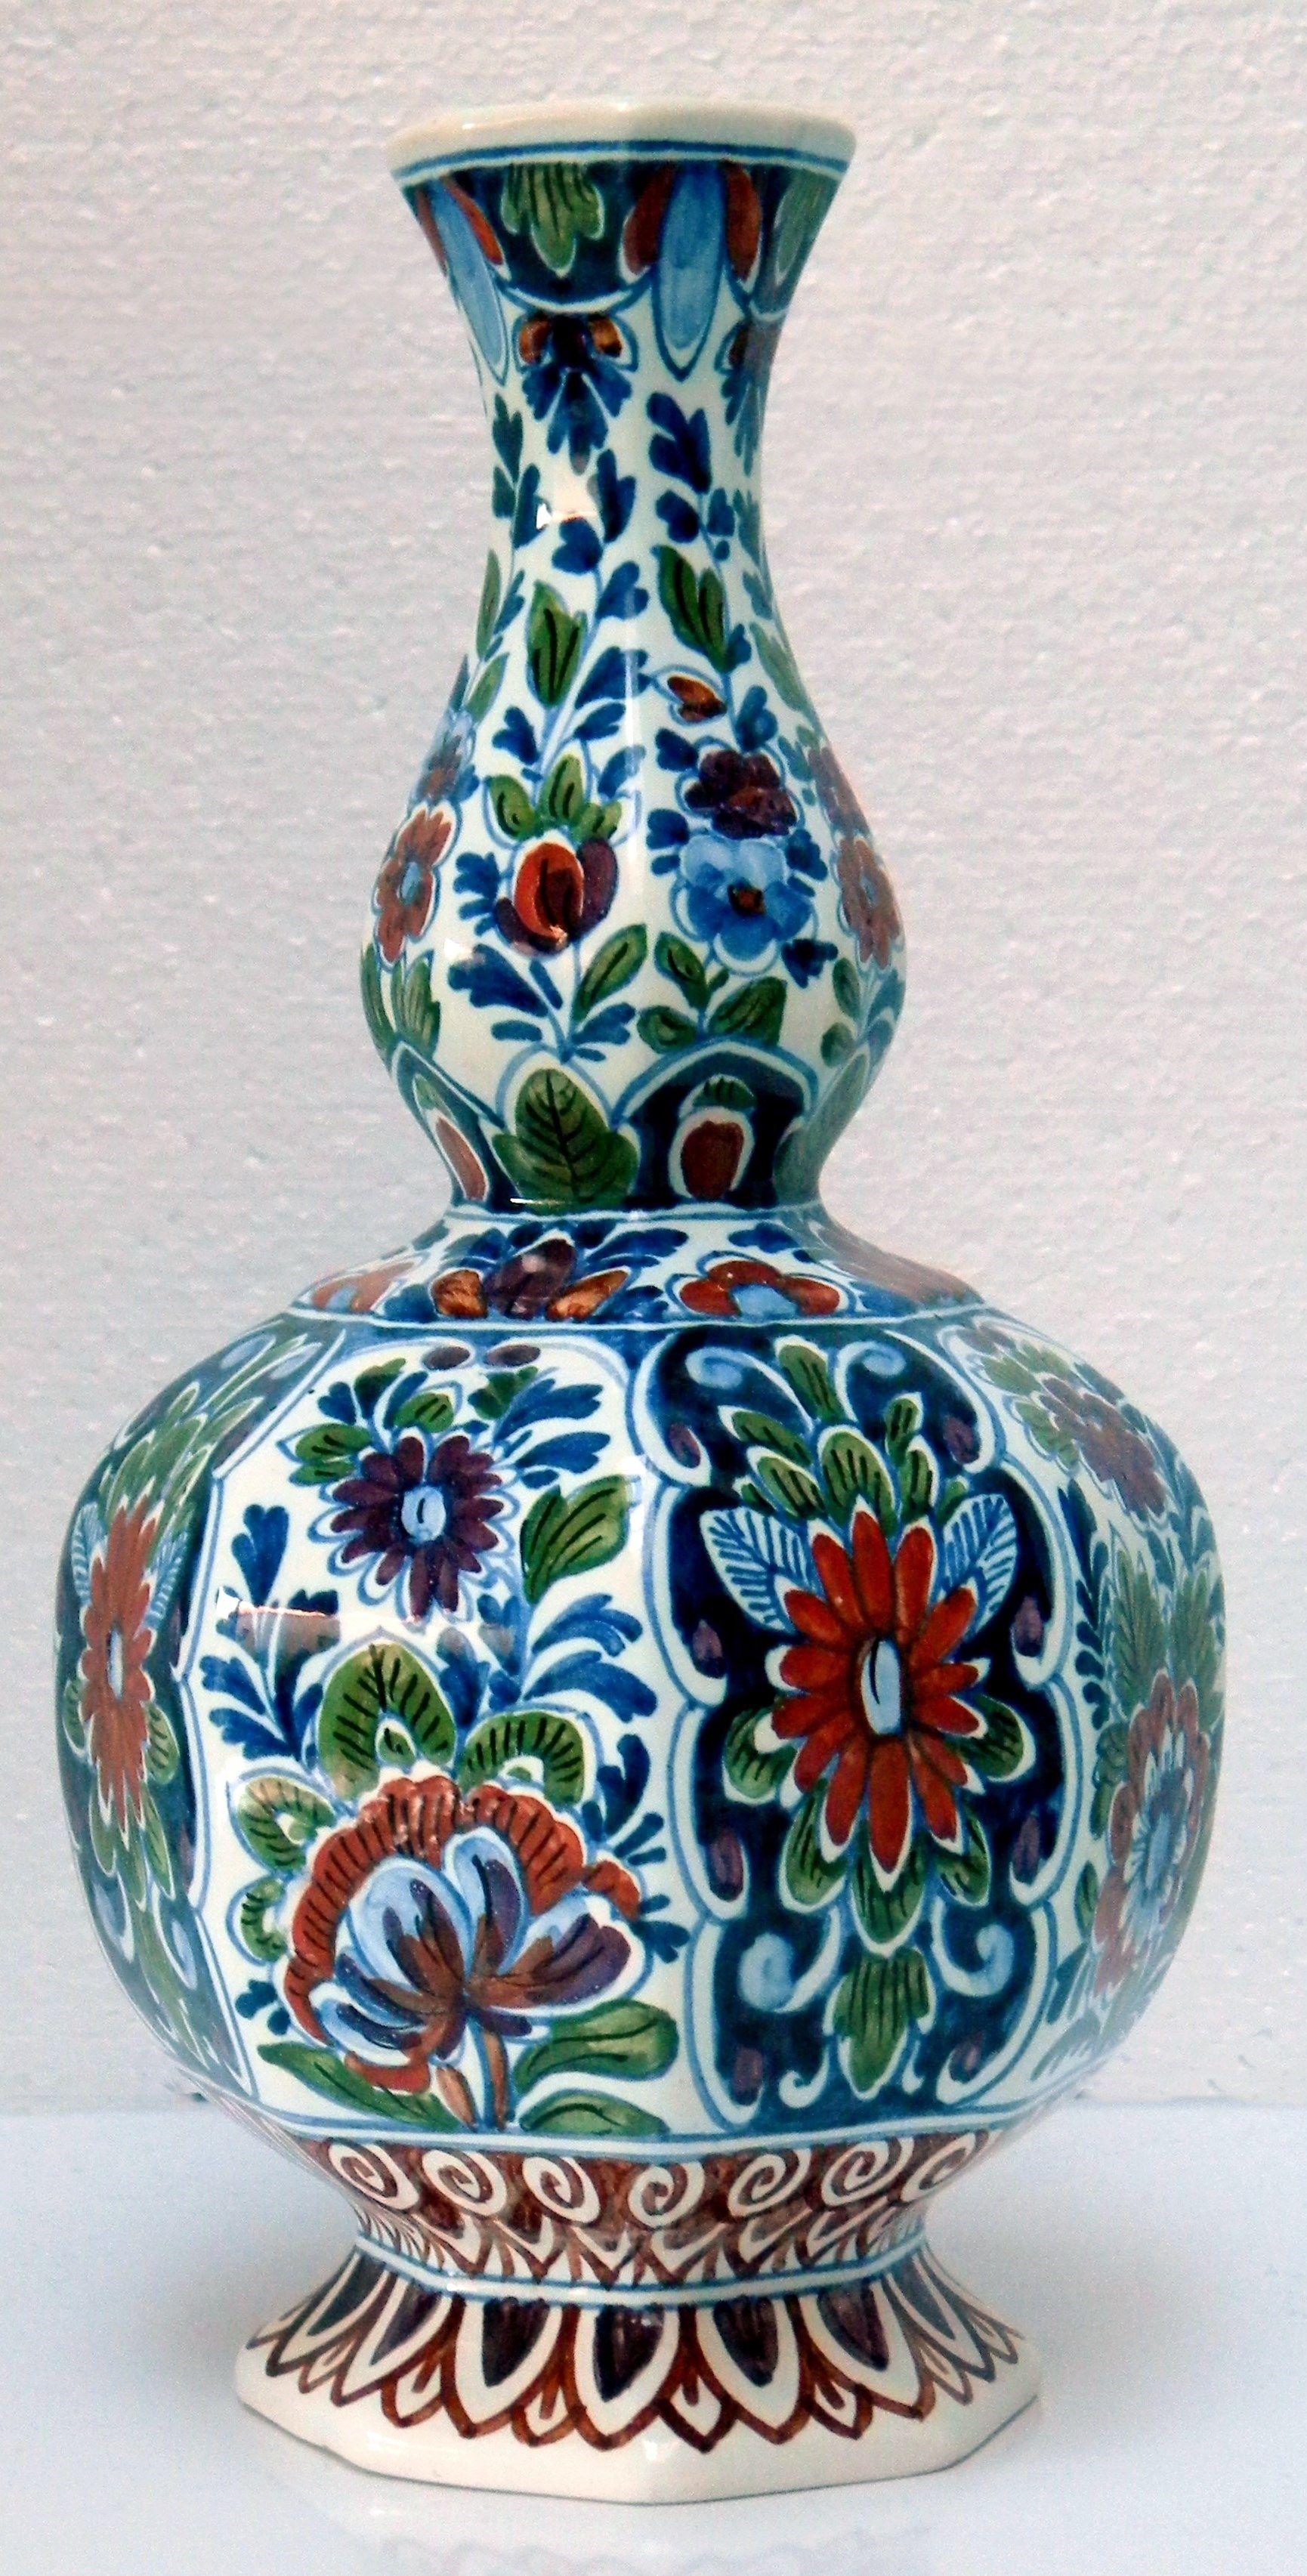 Delft blue polychrome vintage ceramic vase hand painted flowers delft blue polychrome vintage ceramic vase hand painted flowers art pottery collectible reviewsmspy